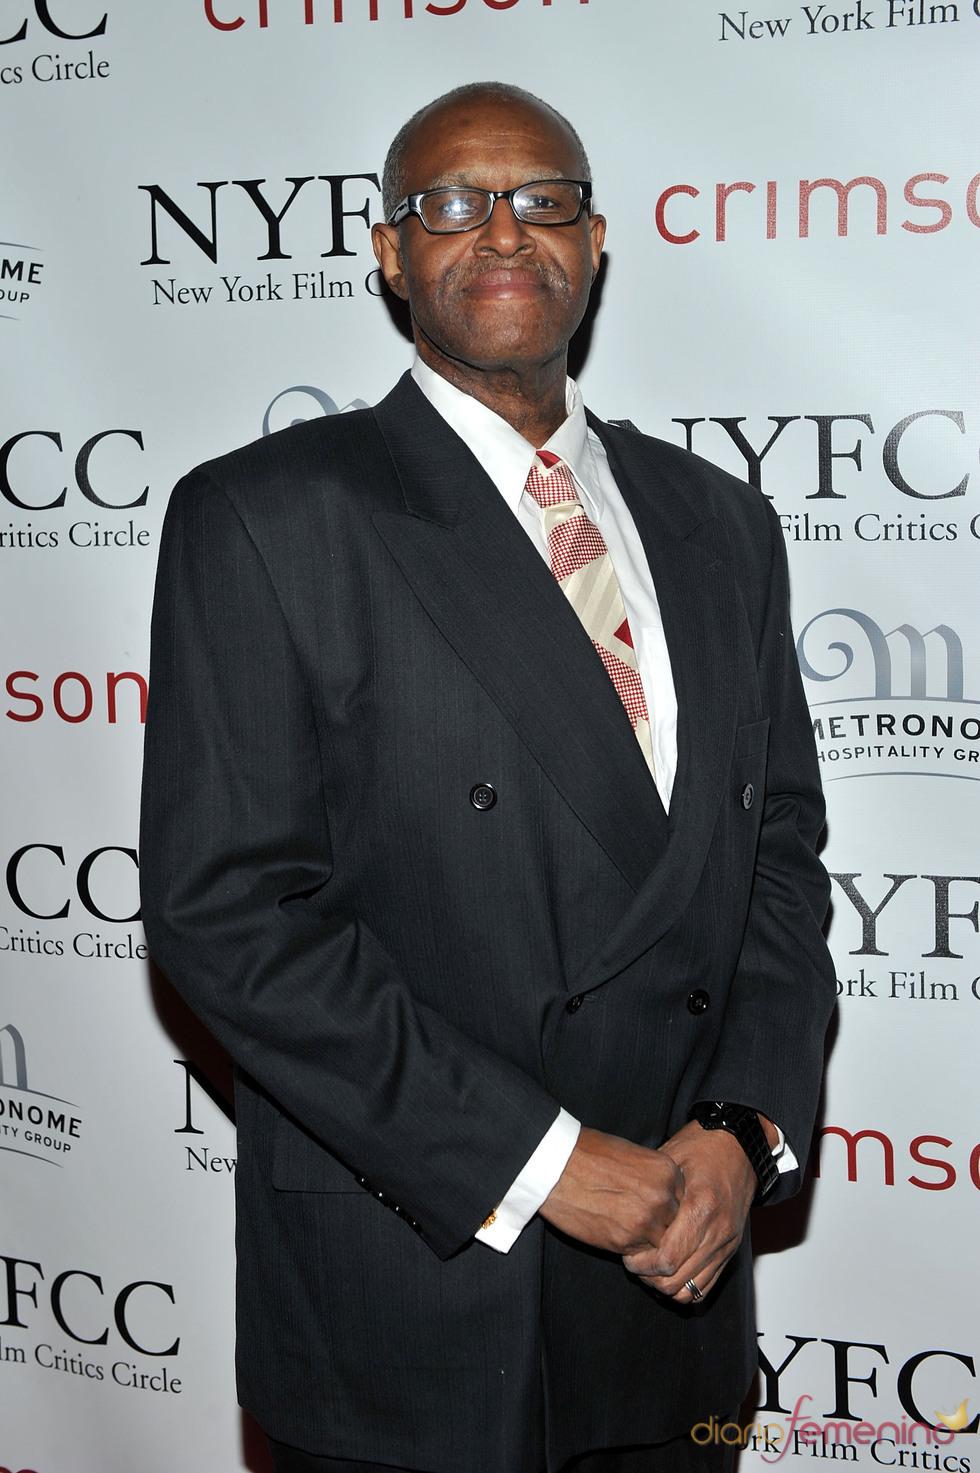 Armond White en la Gala de los Premios Critics 2011